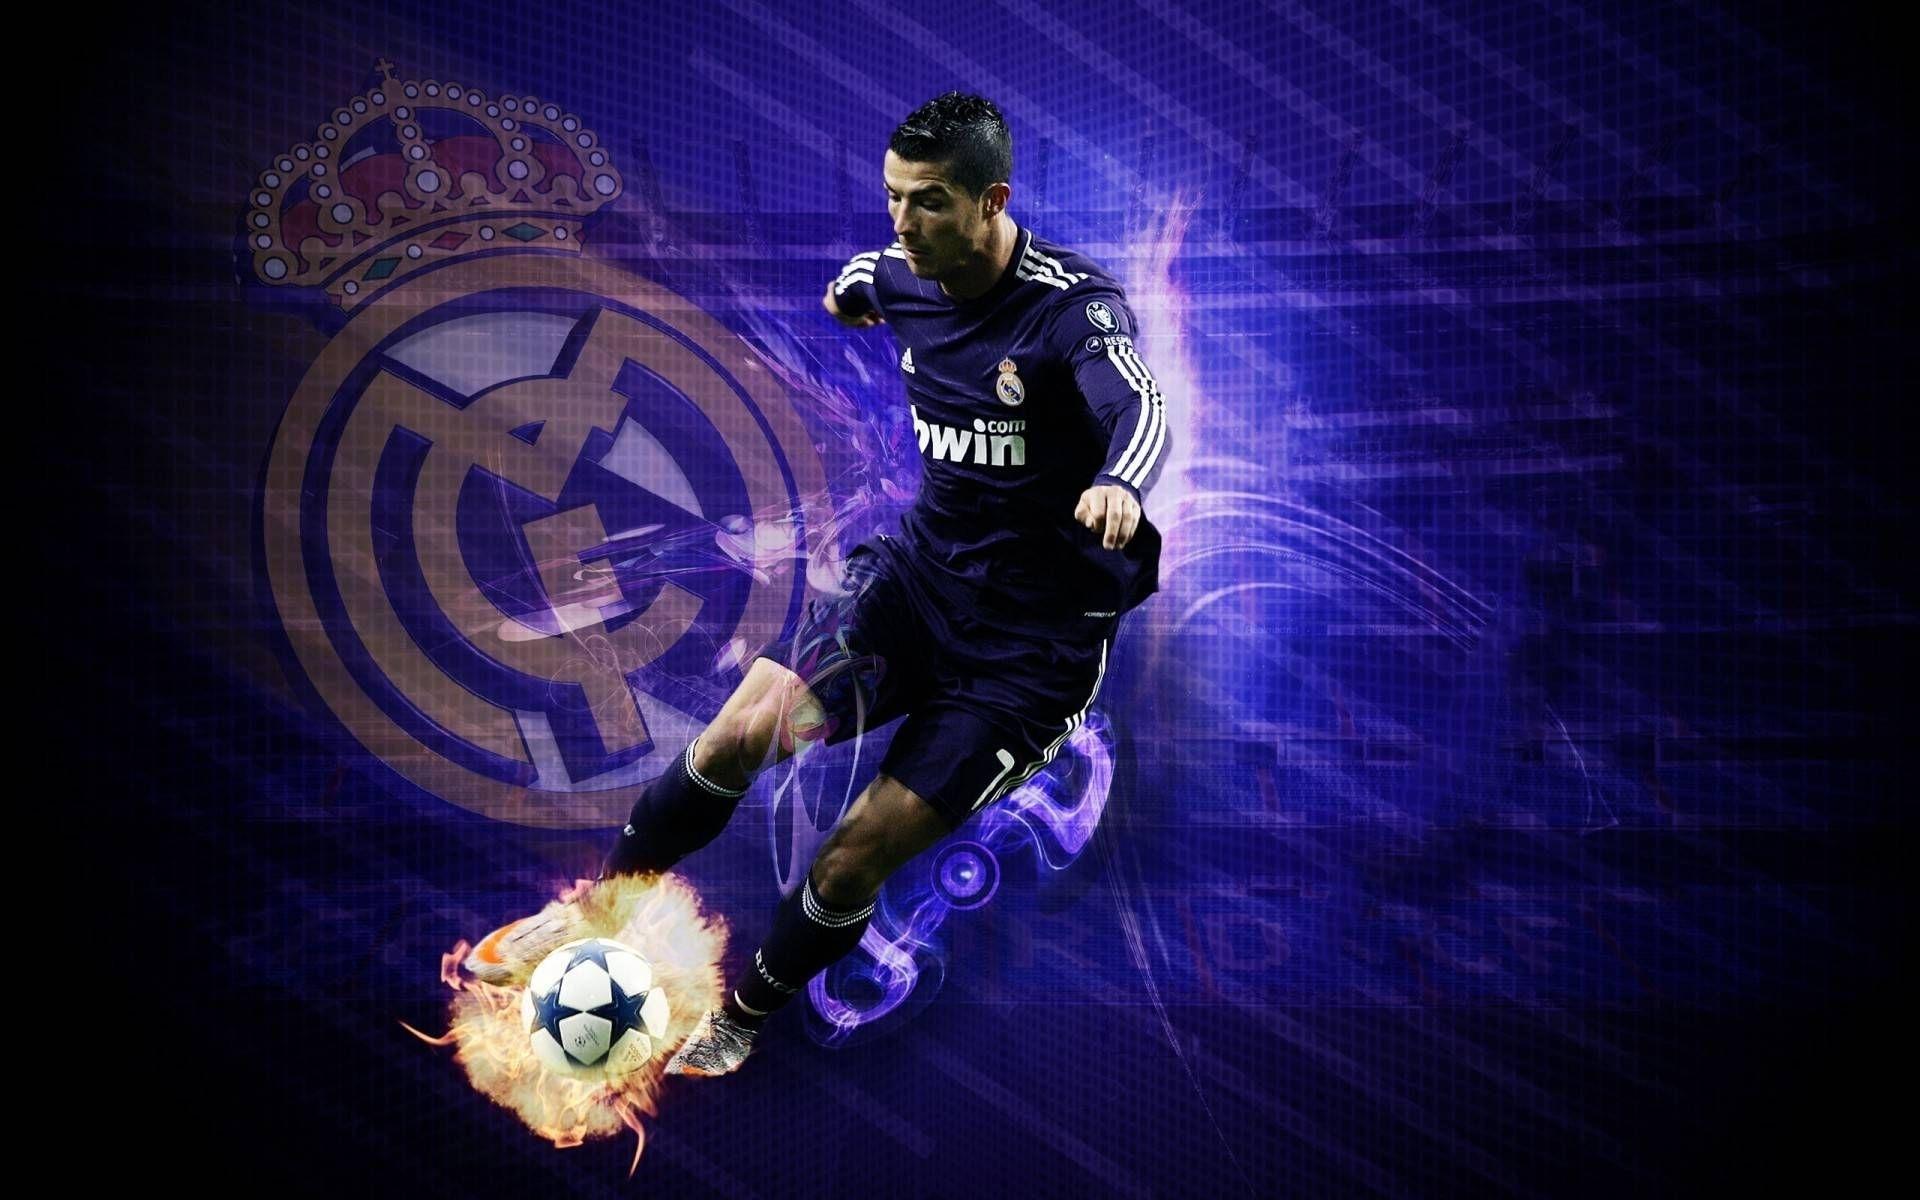 cool soccer backgrounds wallpaper | hd wallpapers | pinterest